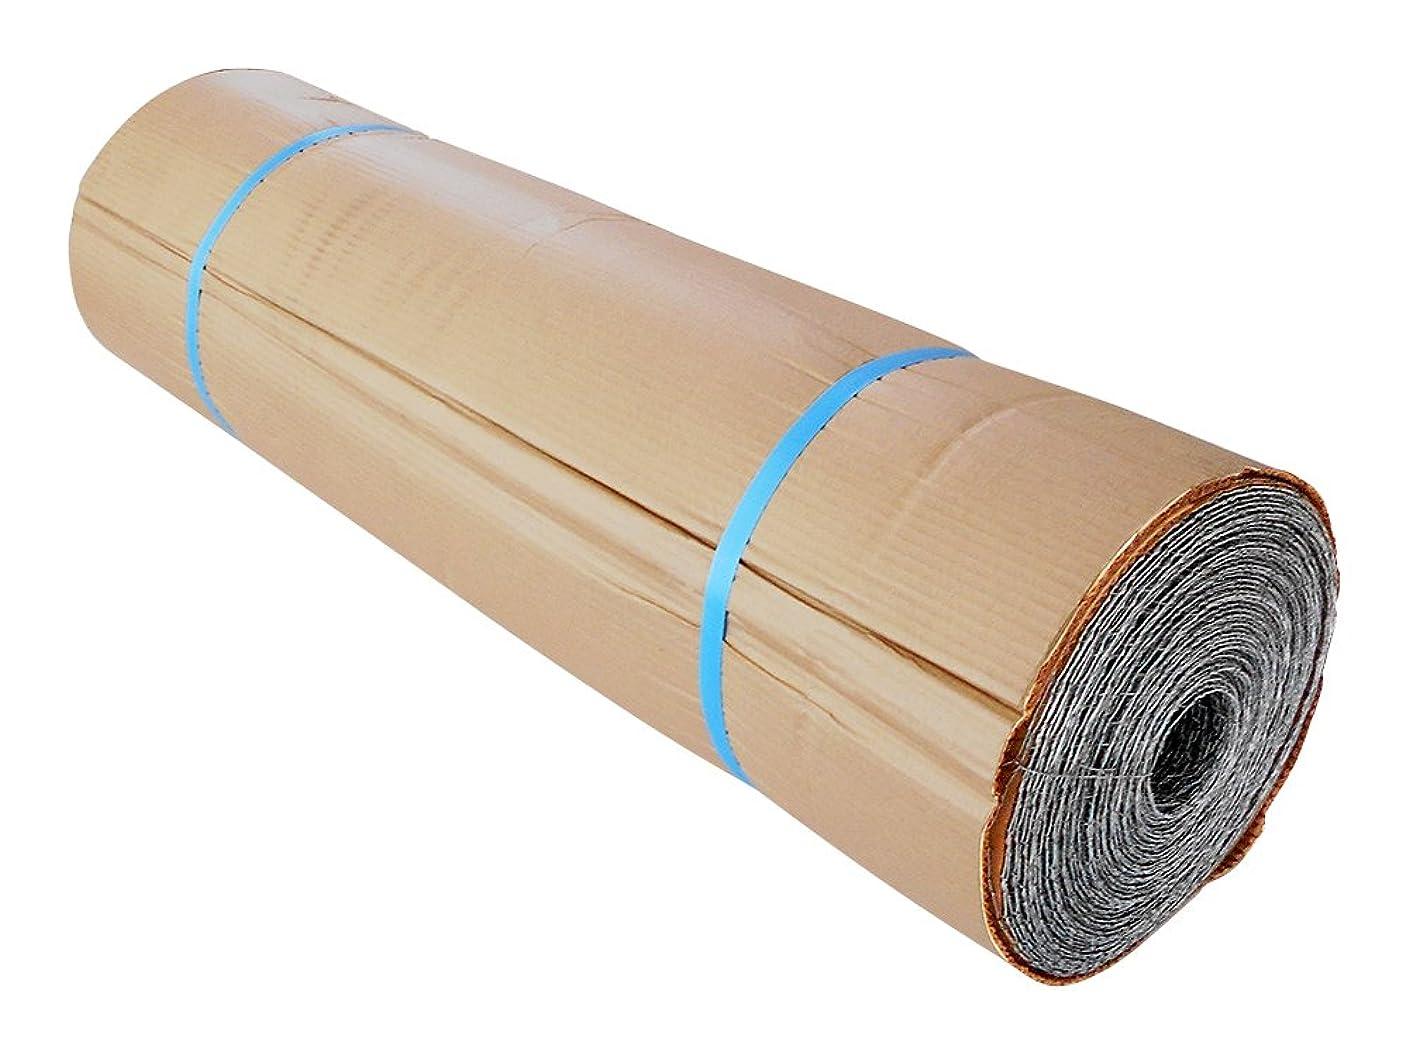 数値ヘッドレス台風WAKI 亜鉛引鉄線亀甲金網 線径#20X10mm 910mm巾X30m長